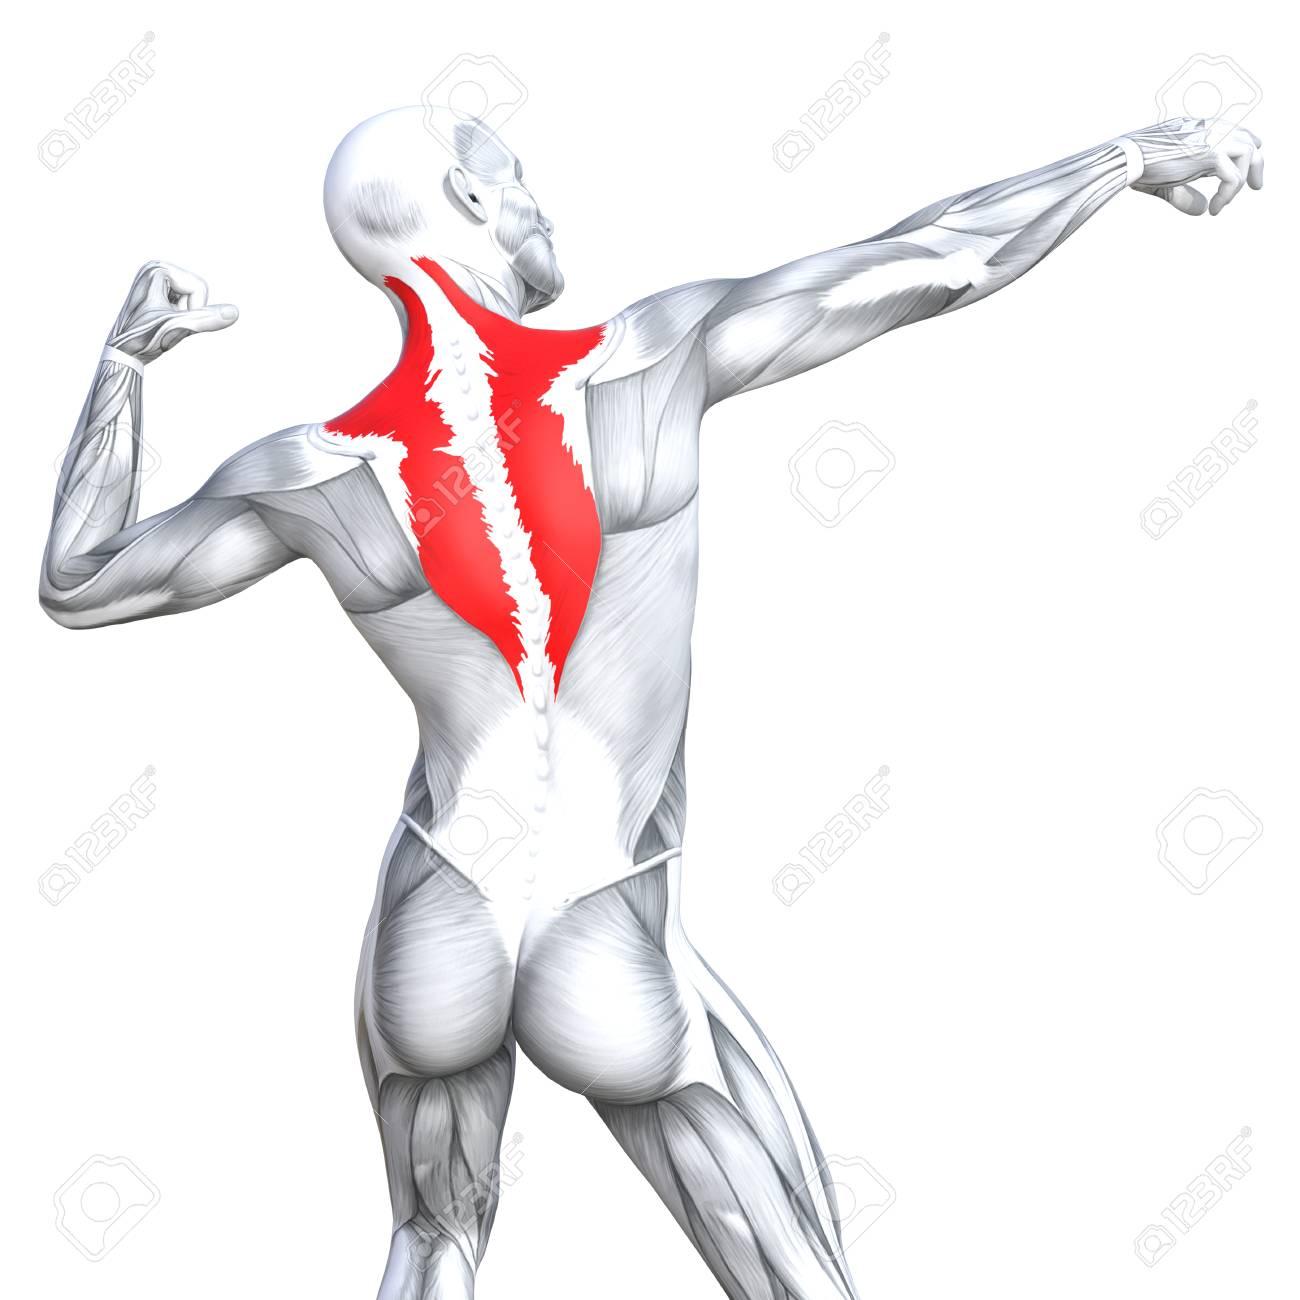 Ilustración Conceptual 3D Volver Ajuste Fuerte Anatomía Humana O ...